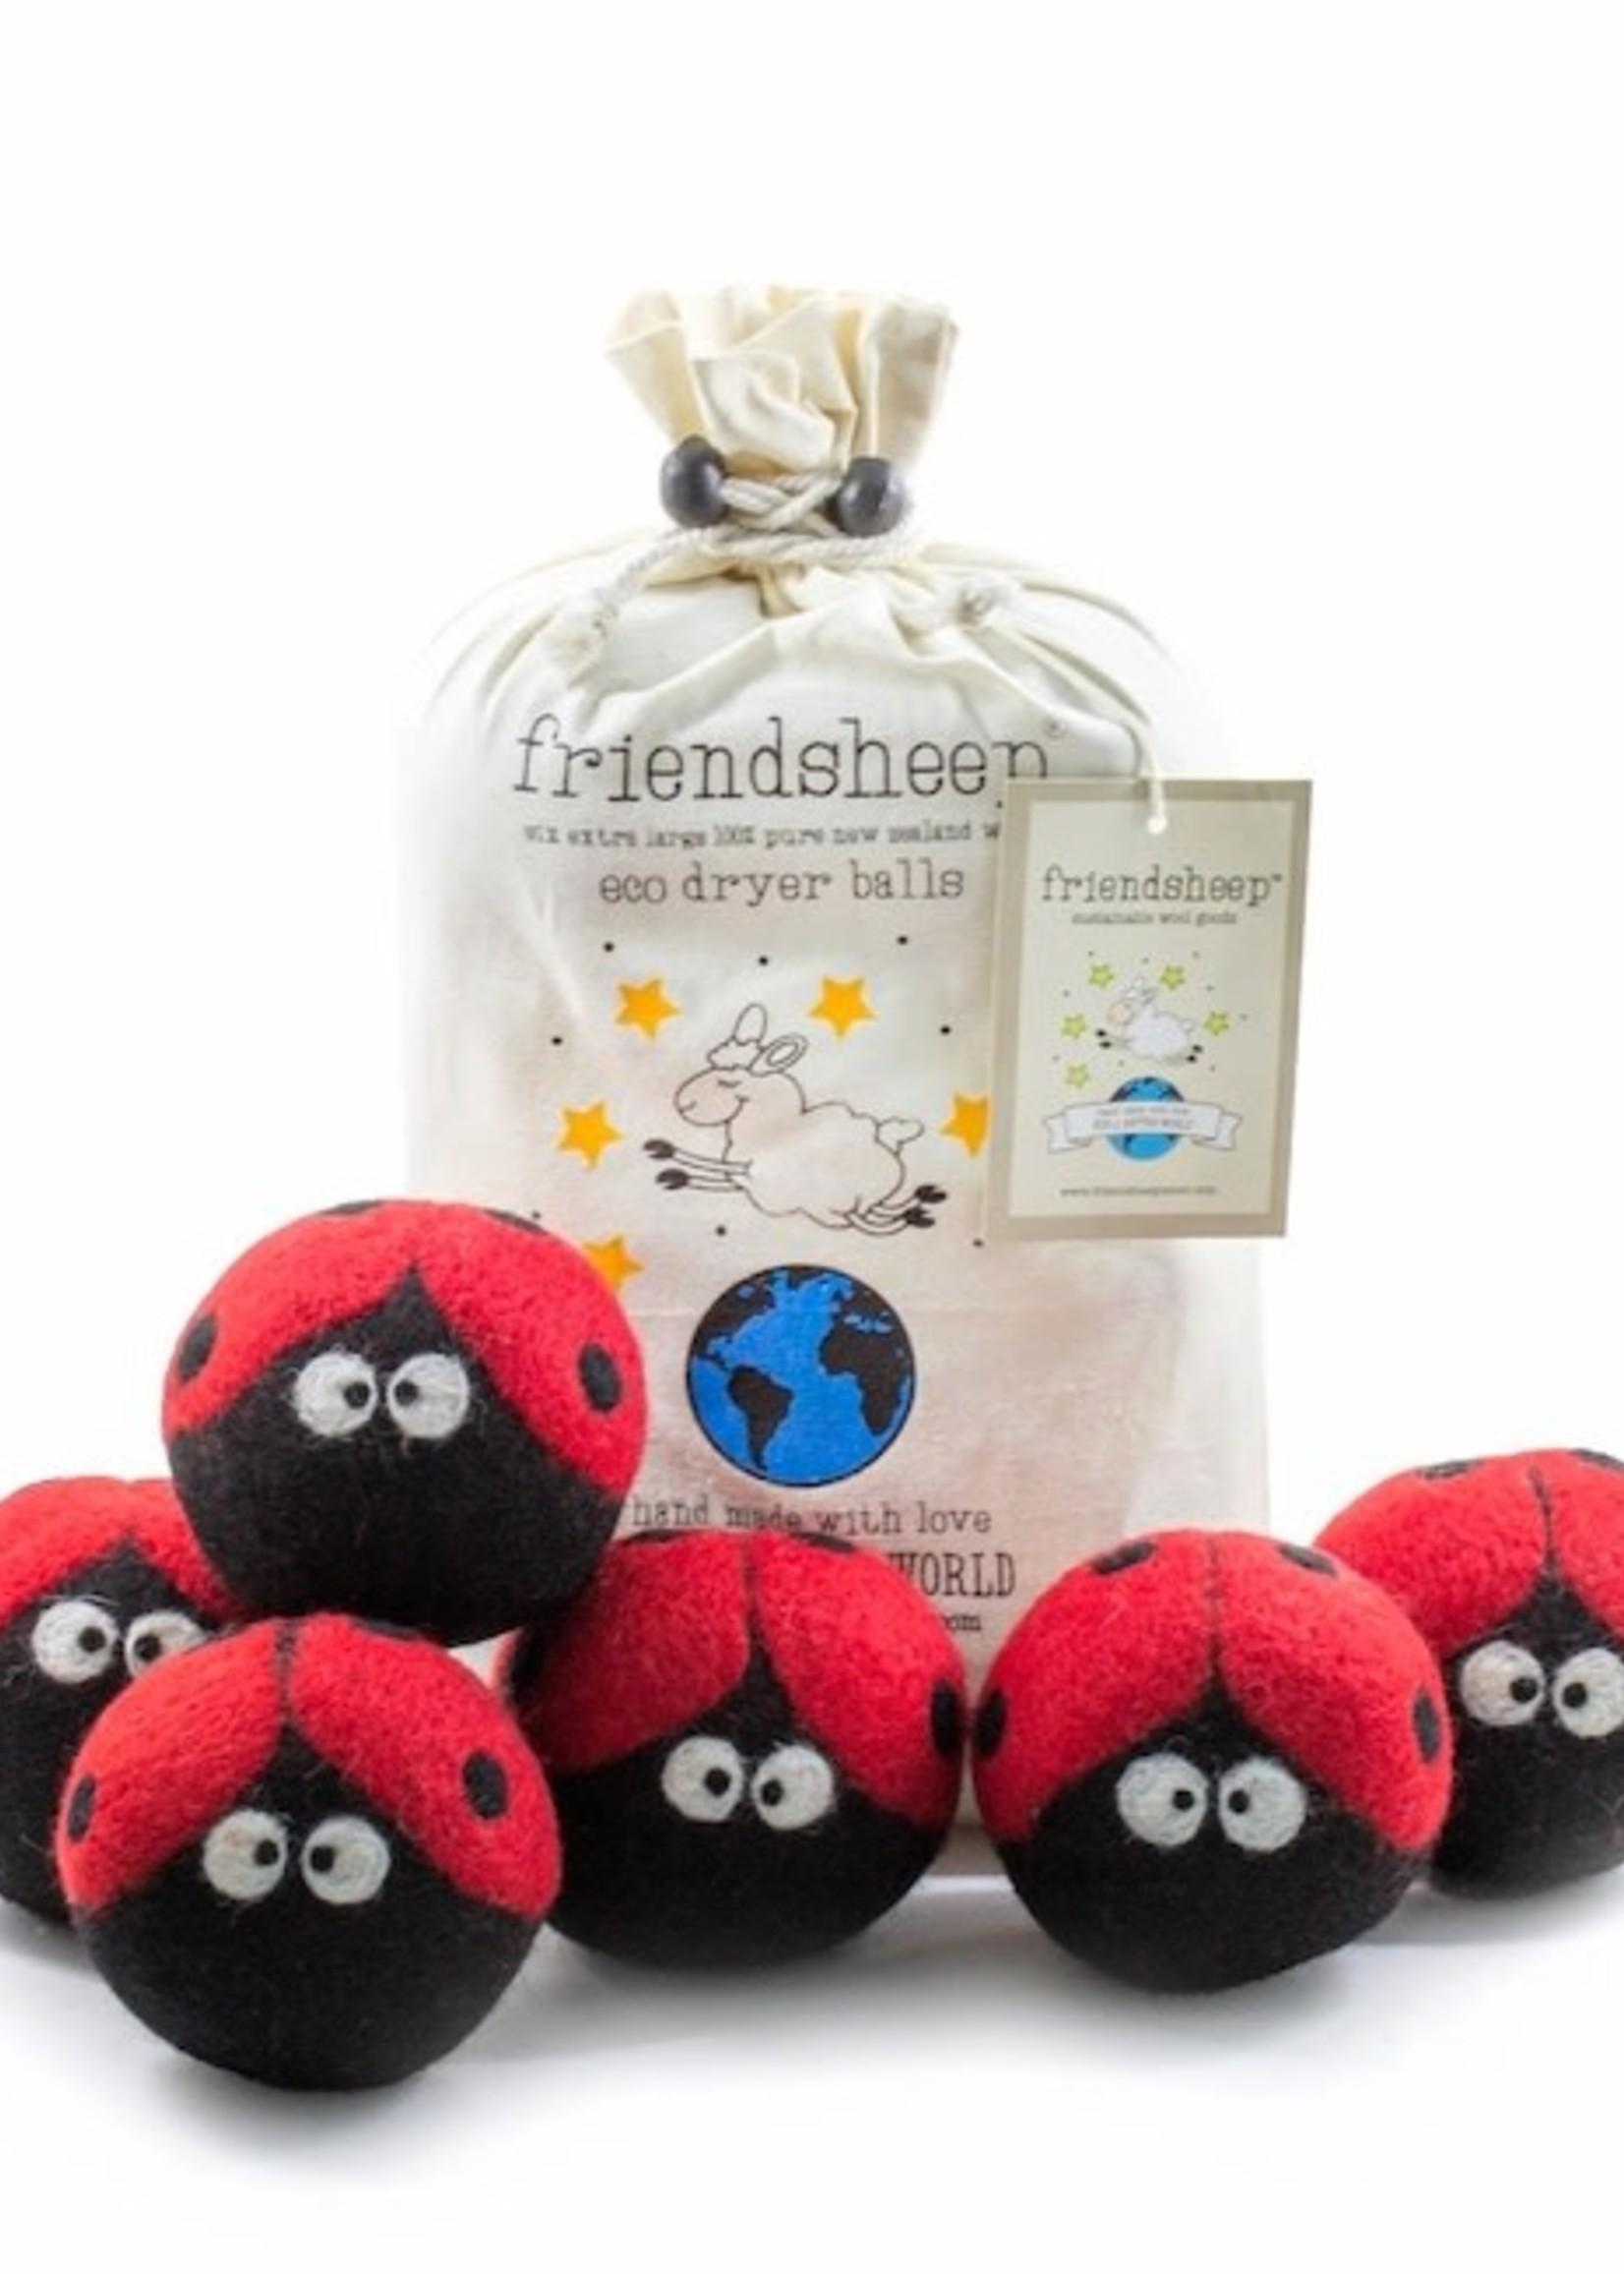 Friendsheep Laundrybugs Dryer Balls